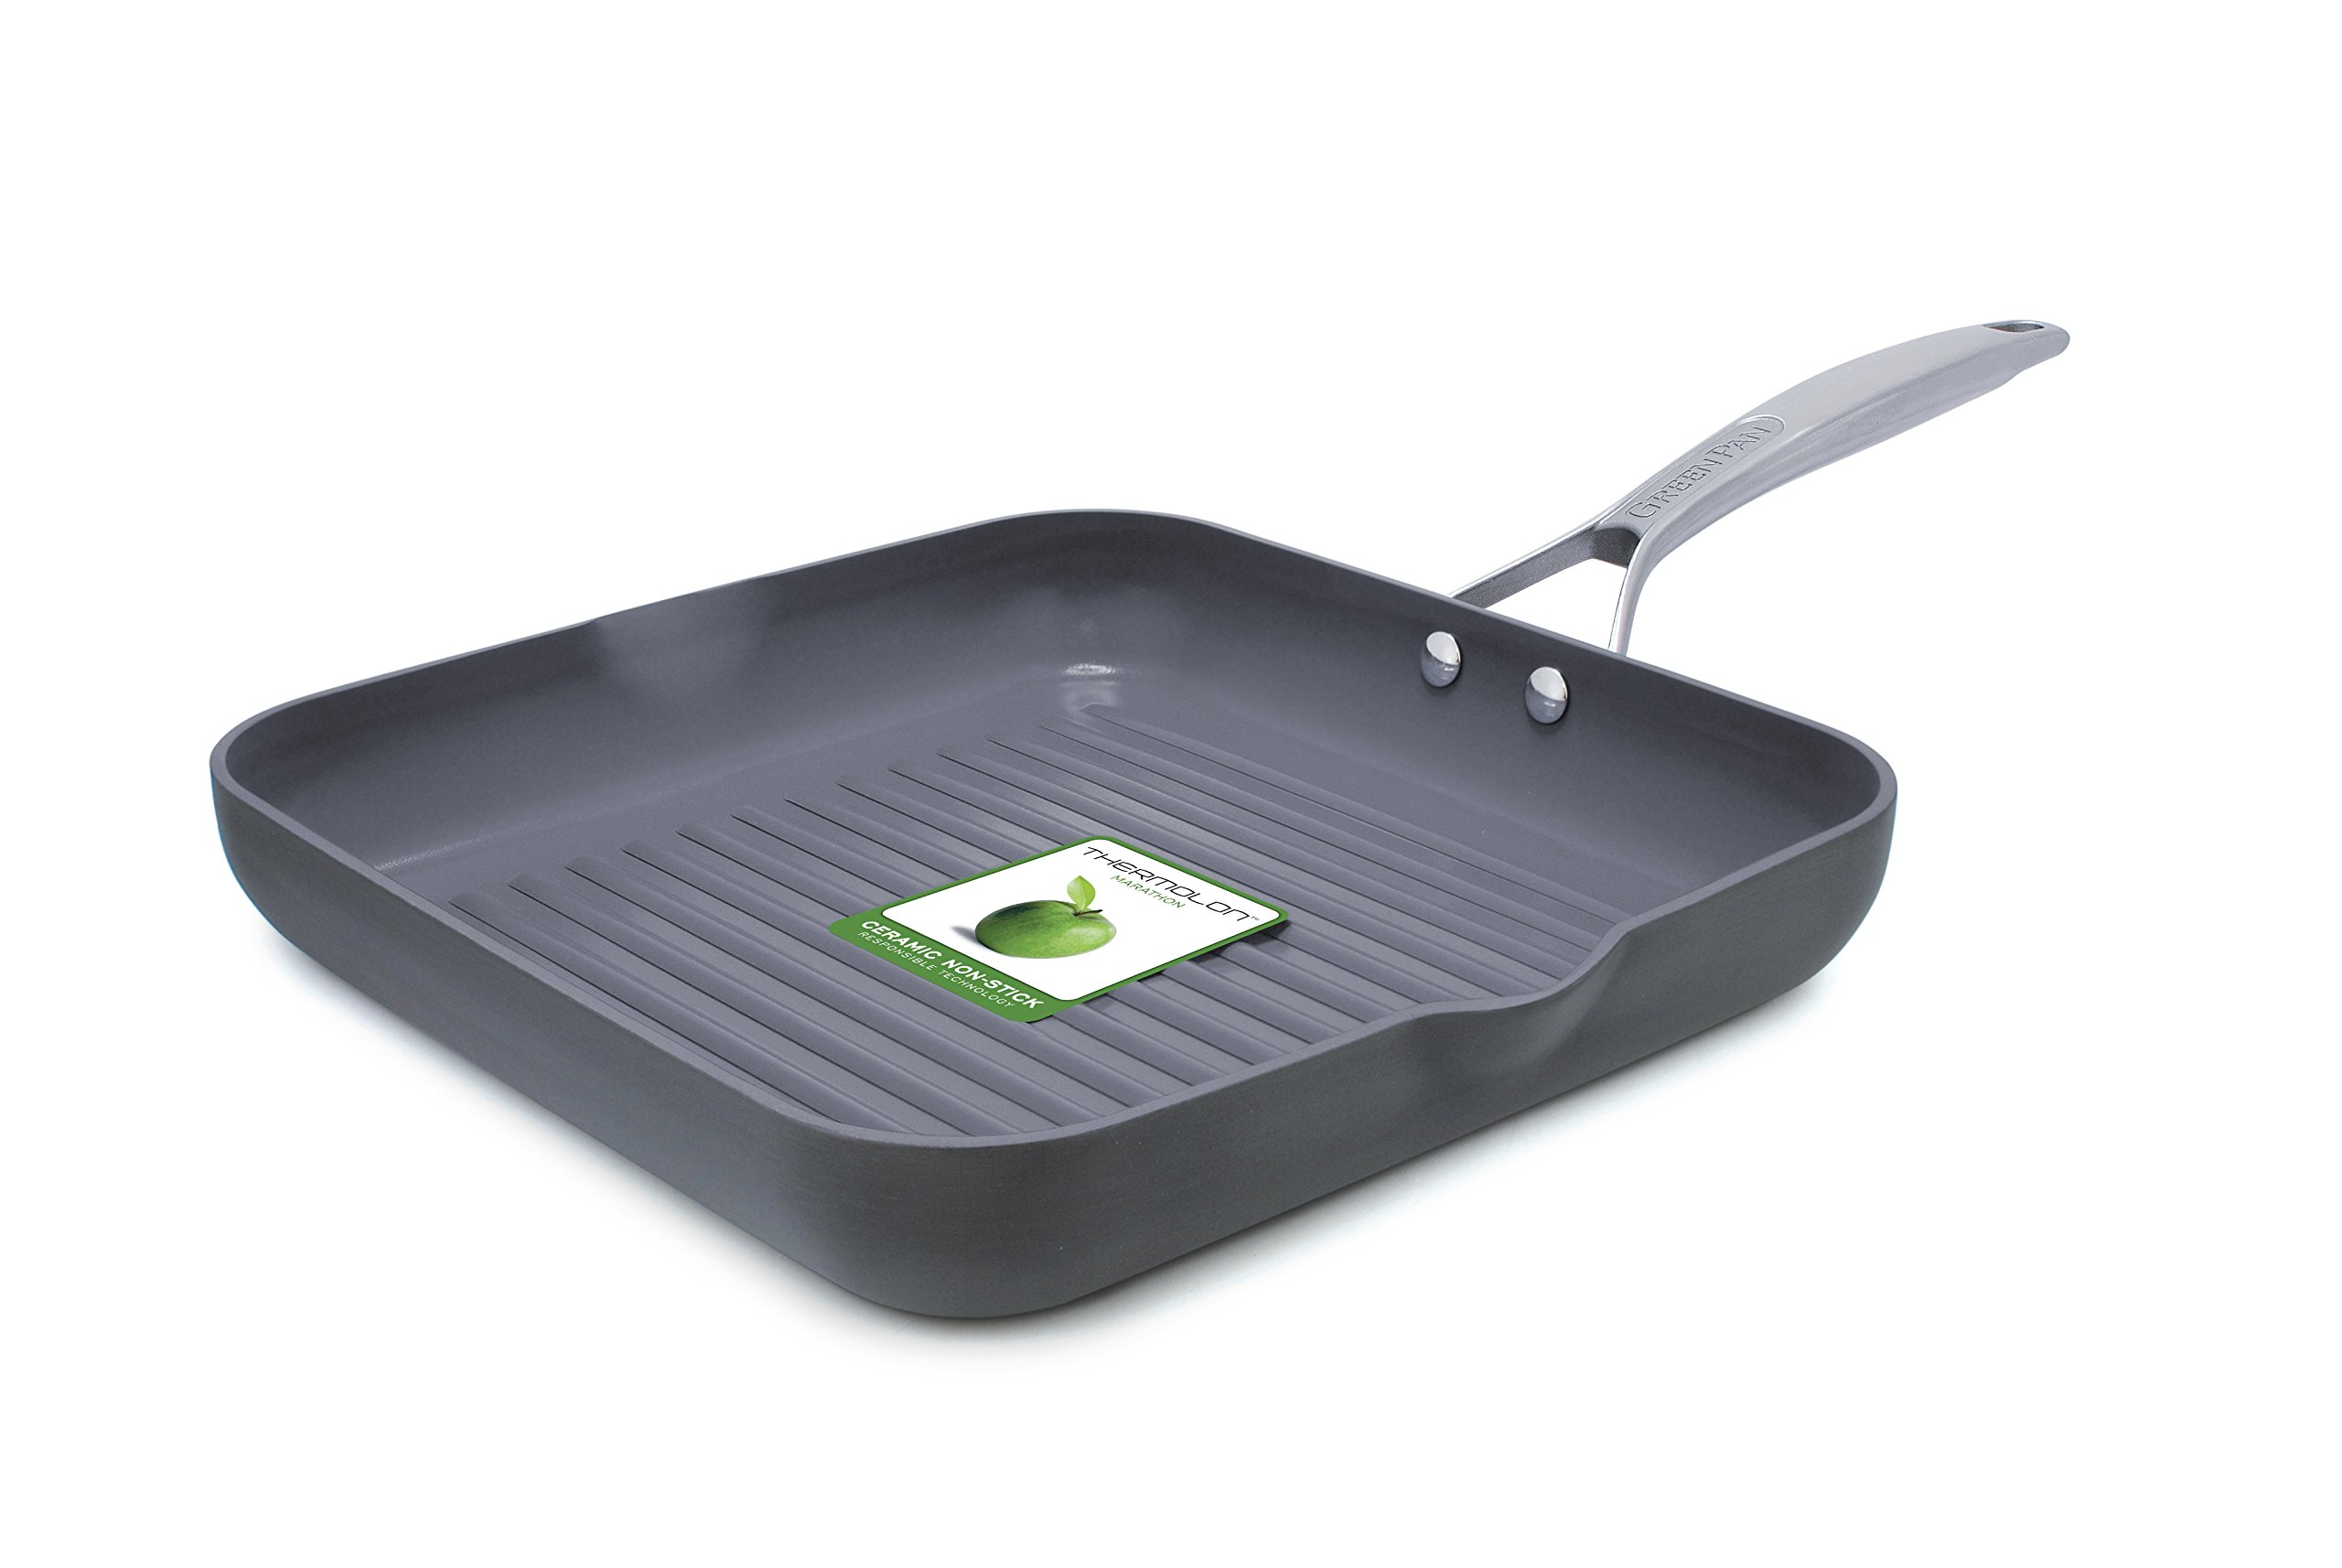 GreenPan Paris 11 Inch Ceramic Non-Stick Square Grill Pan